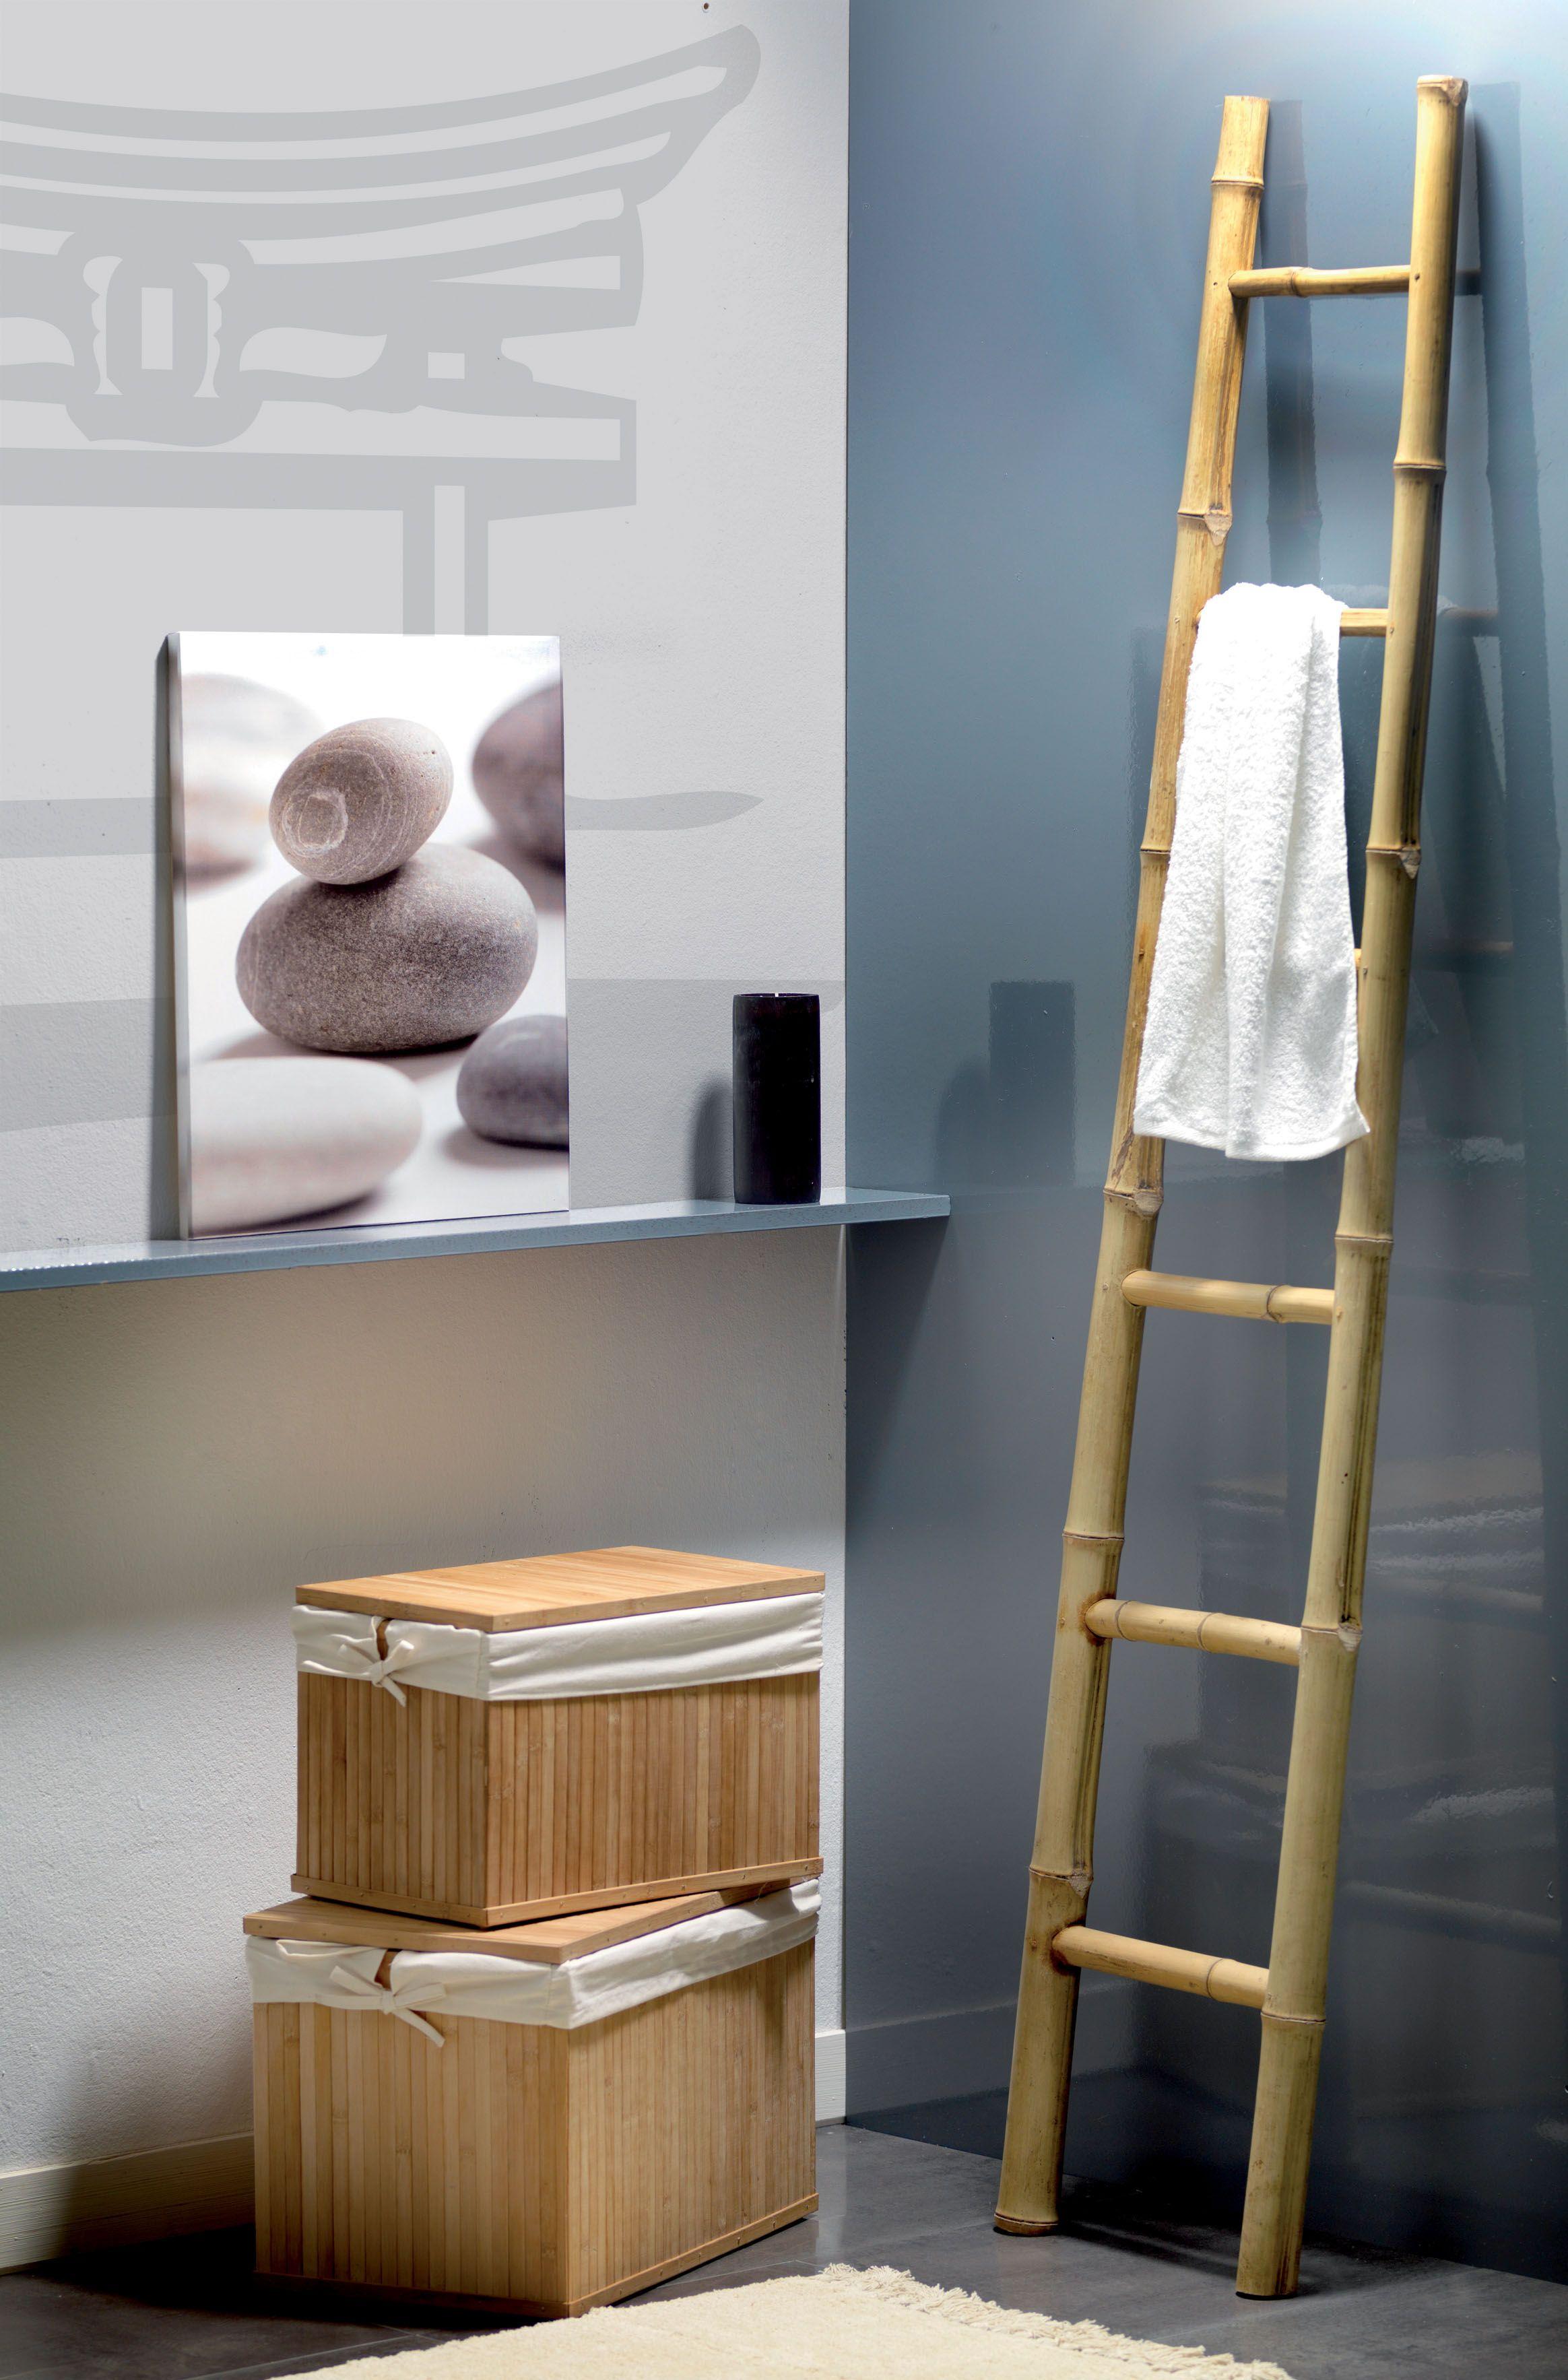 salle de bain zen centrakor ma salle de bain pinterest salle de bain zen zen et salle de. Black Bedroom Furniture Sets. Home Design Ideas